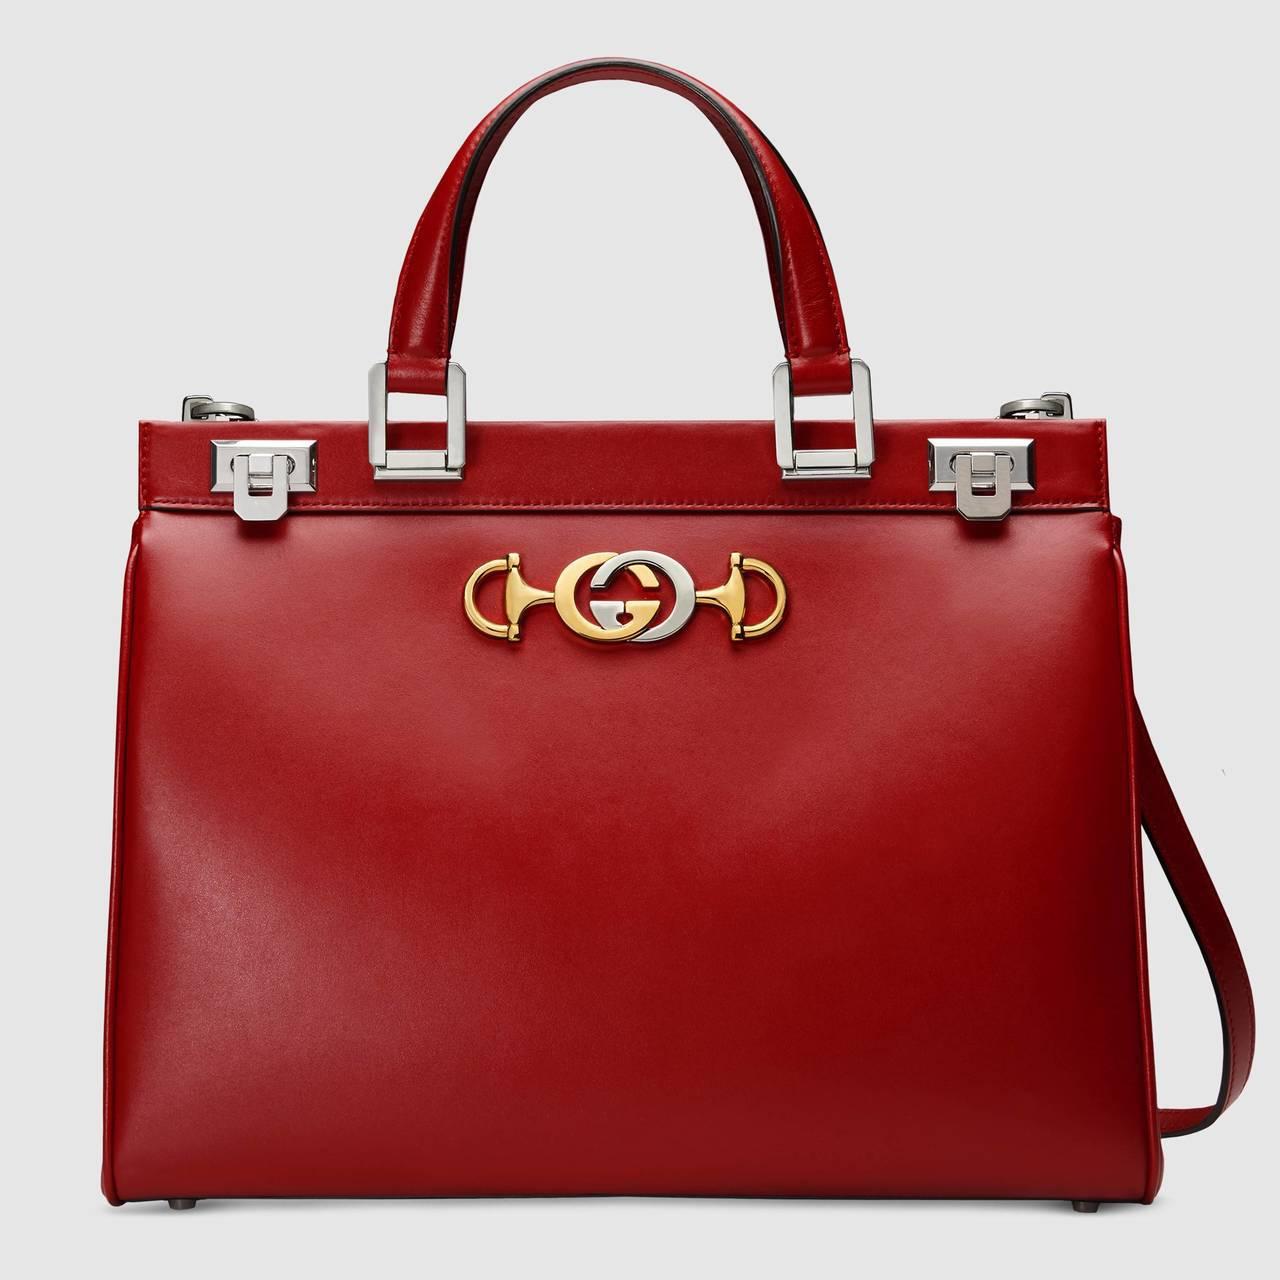 Gucci Zumi紅色提包,12萬6,200元。圖/Gucci提供